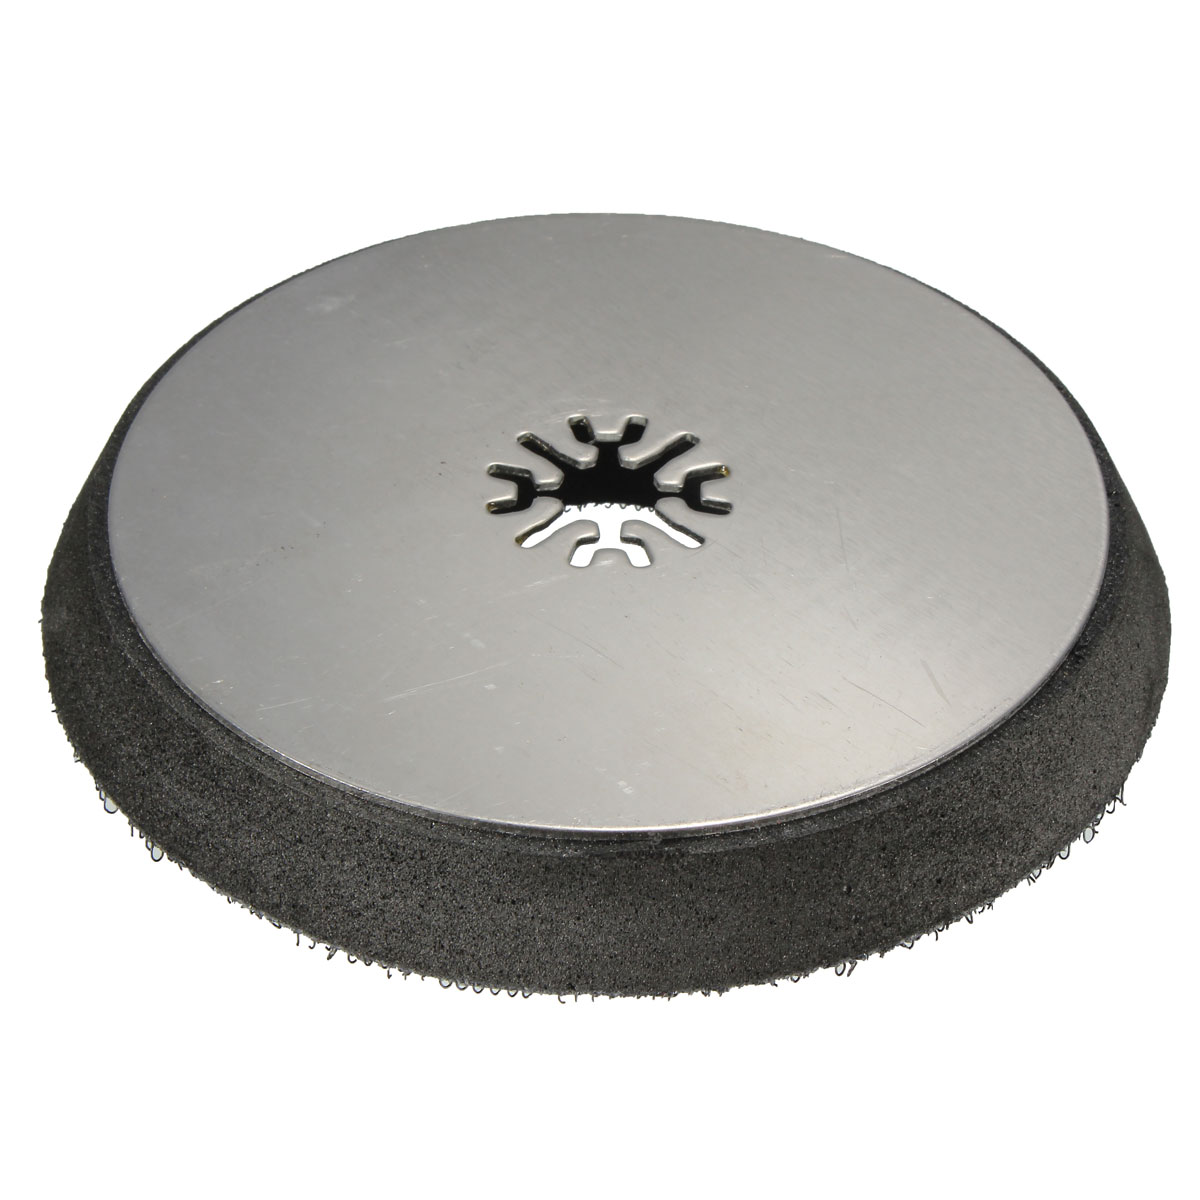 Disc Sand Base Steel and EVA Sanding Pad Oscillating MultiTool For Boschs Fein Metal Wood Surface Polishing